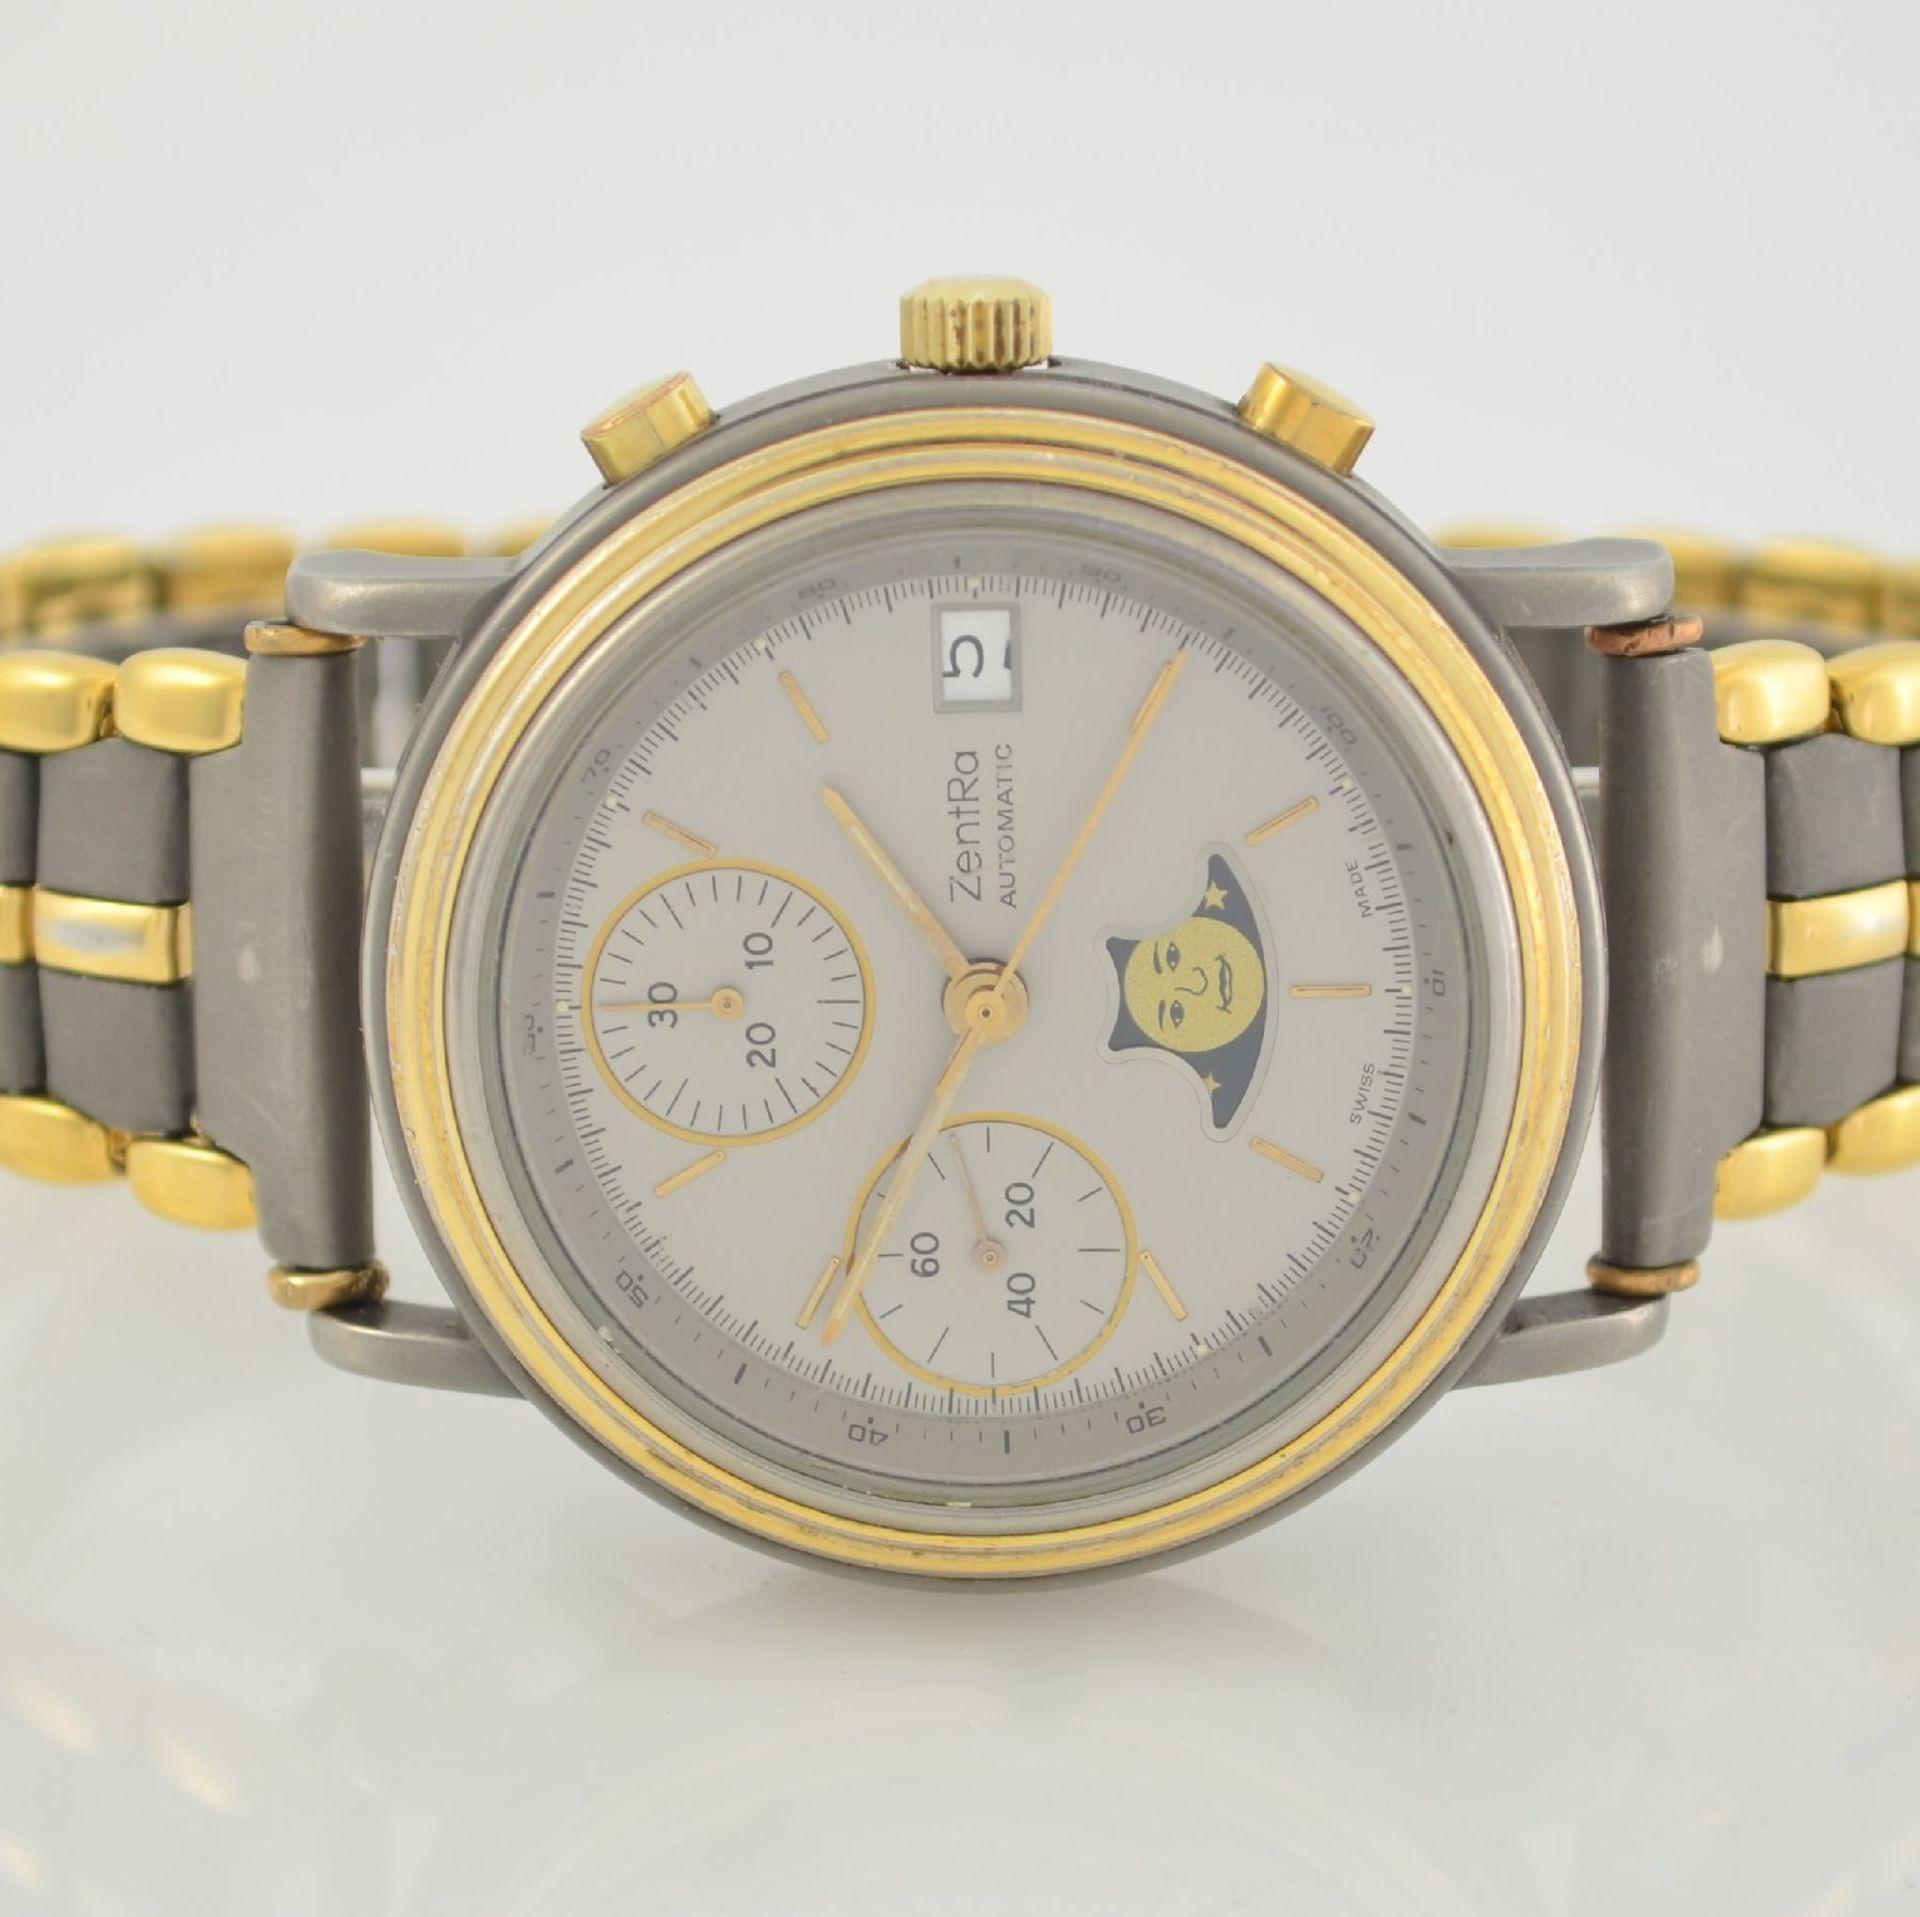 ZENTRA Herrenarmbanduhr Armbandchronograph, Automatik, Schweiz um 1987, Titangeh. inkl. - Bild 2 aus 6